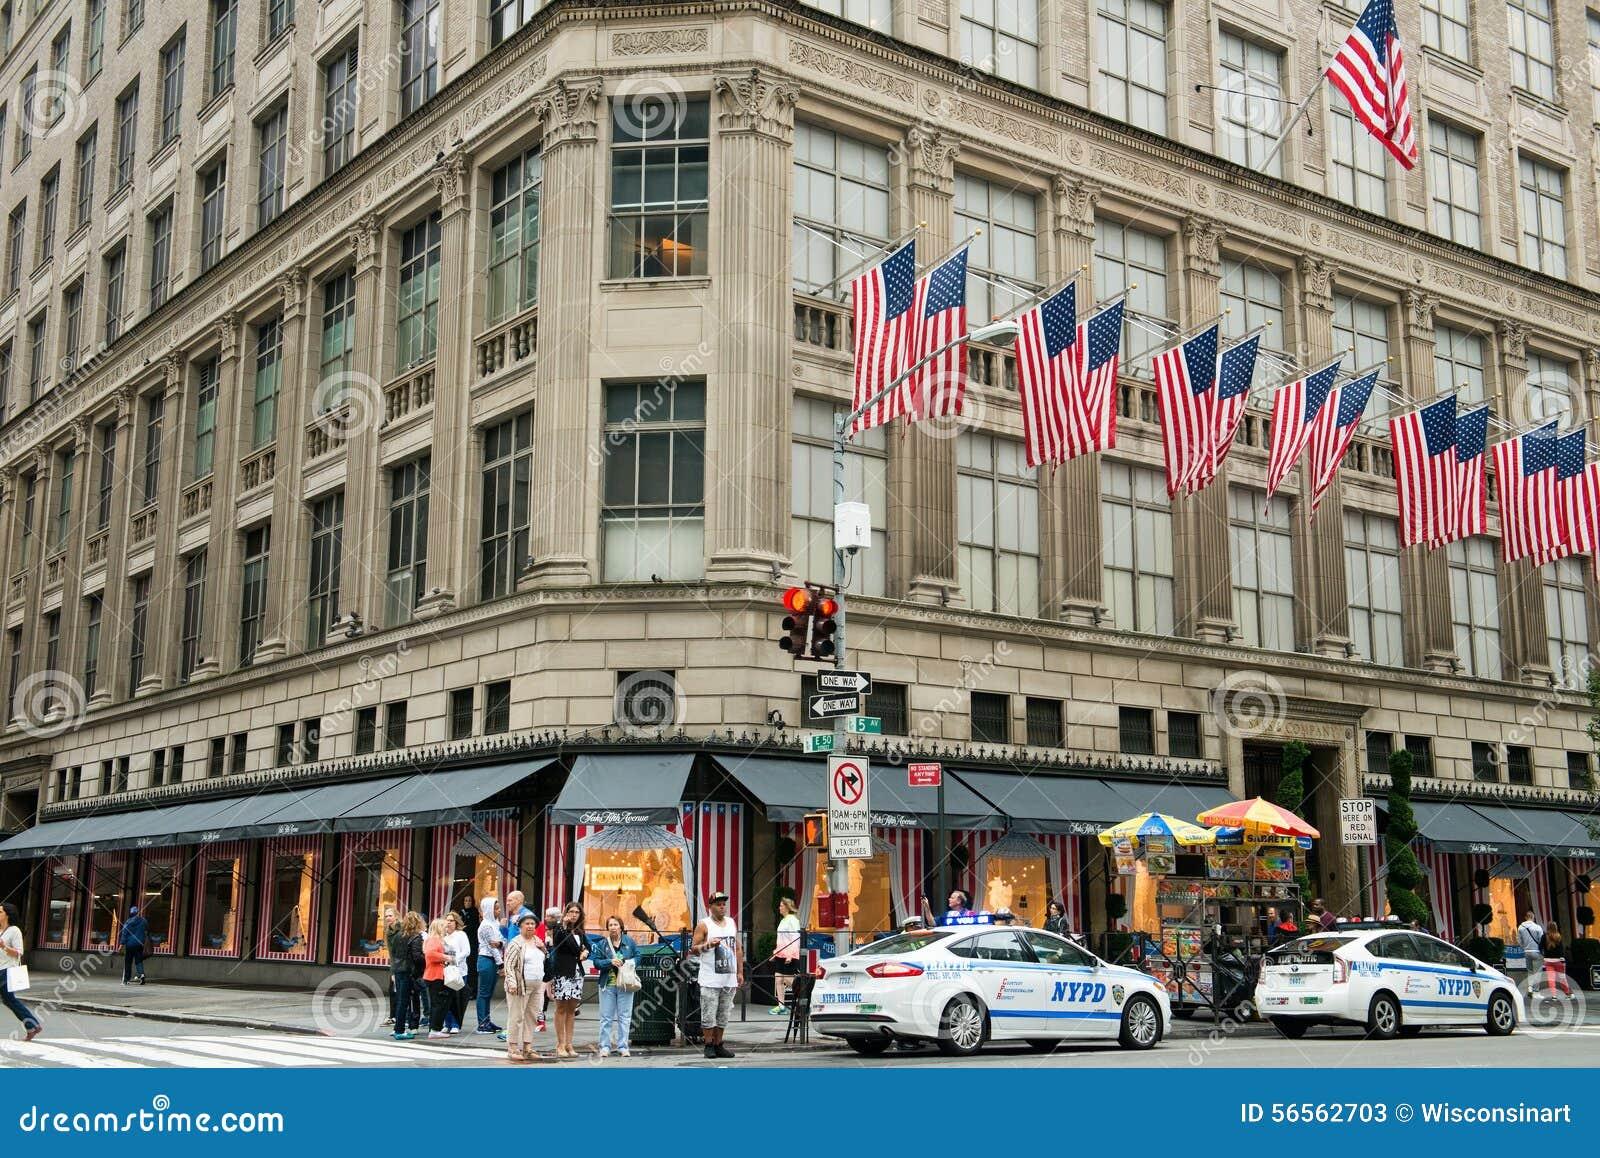 Download Πόλη της Νέας Υόρκης Πεμπτών Λεωφόρος της Saks Εκδοτική Στοκ Εικόνες - εικόνα από λεωφόρων, άνθρωποι: 56562703